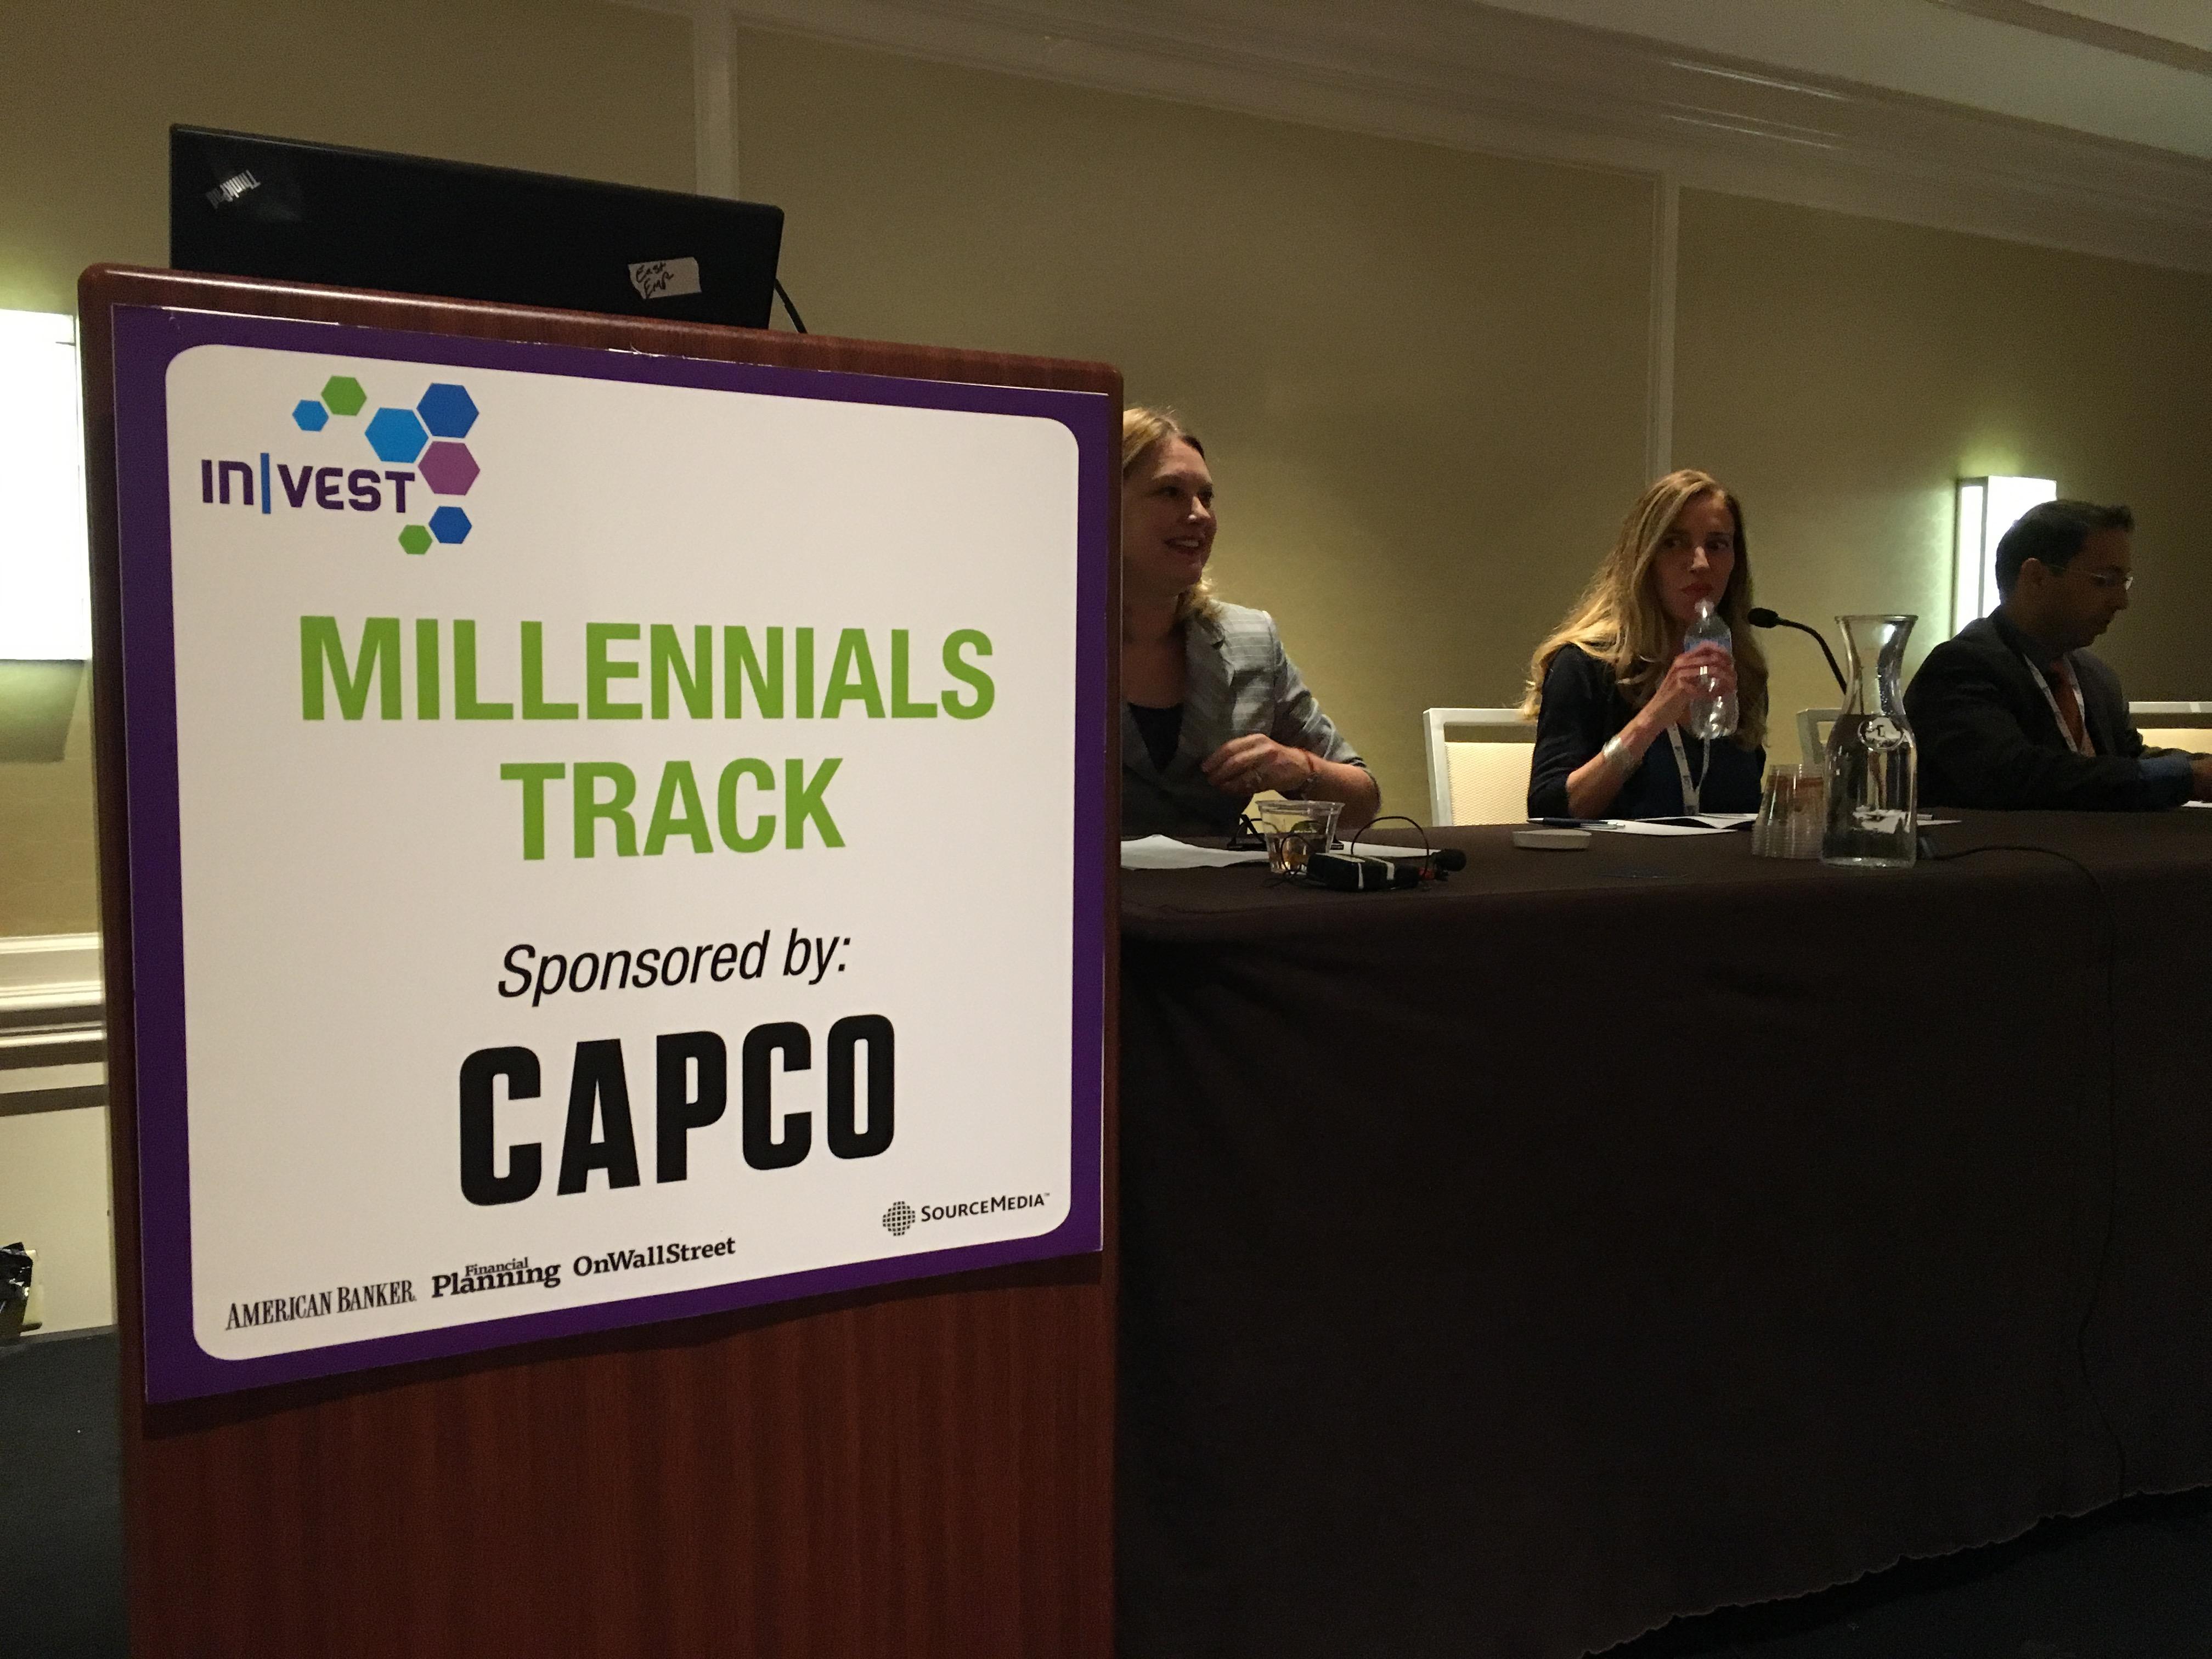 https://assets.sourcemedia.com/b3/ef/a1aa0cda45f78c8e59651c19f0bc/invest-conference-millennials-track.JPG